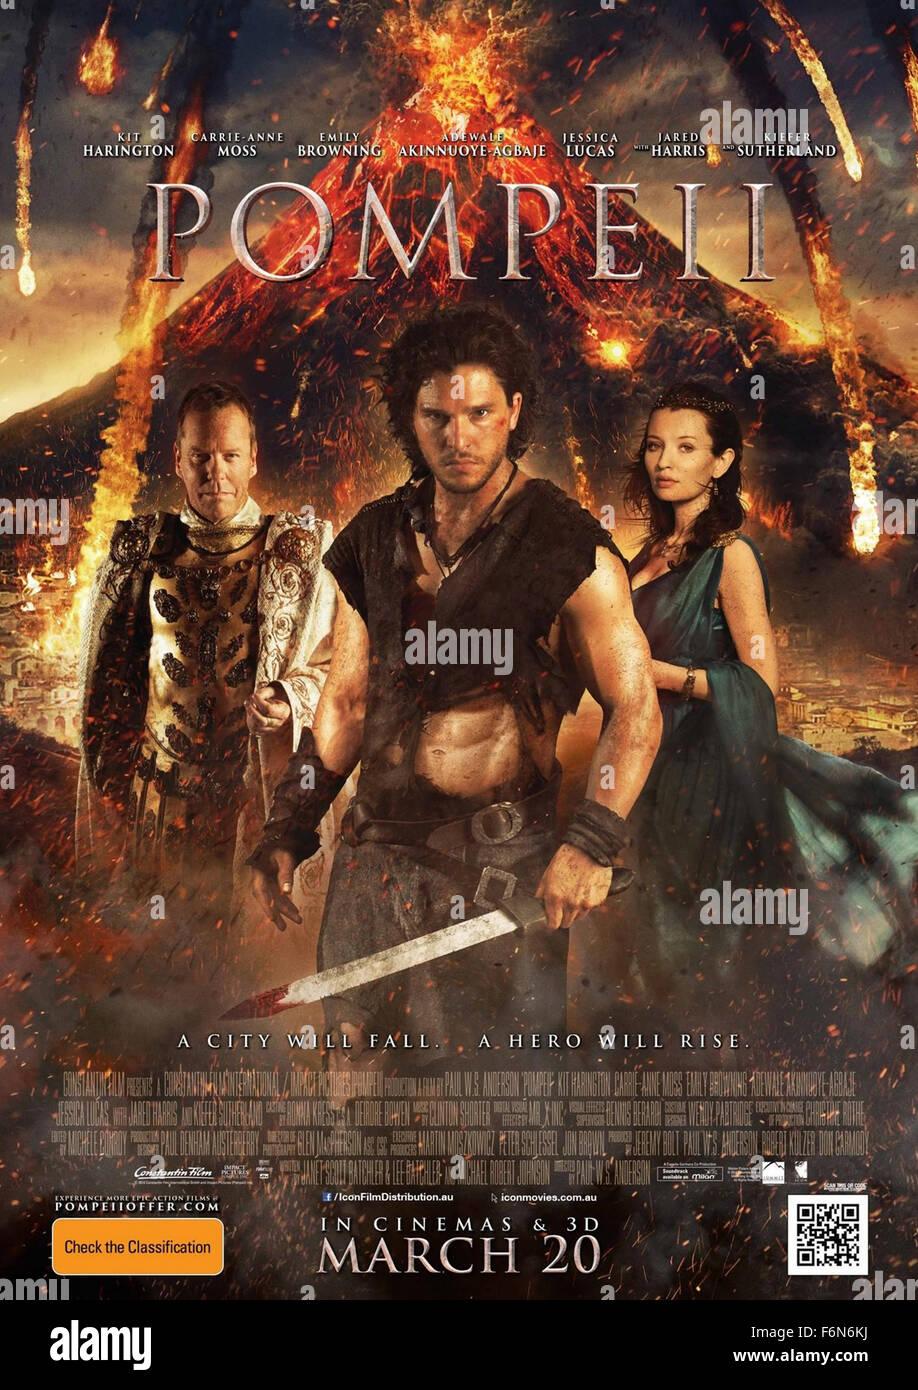 https www alamy com stock photo feb 24 2014 hollywood us pompeii poster 2013keifer sutherlandkit haringtonemily 90206022 html